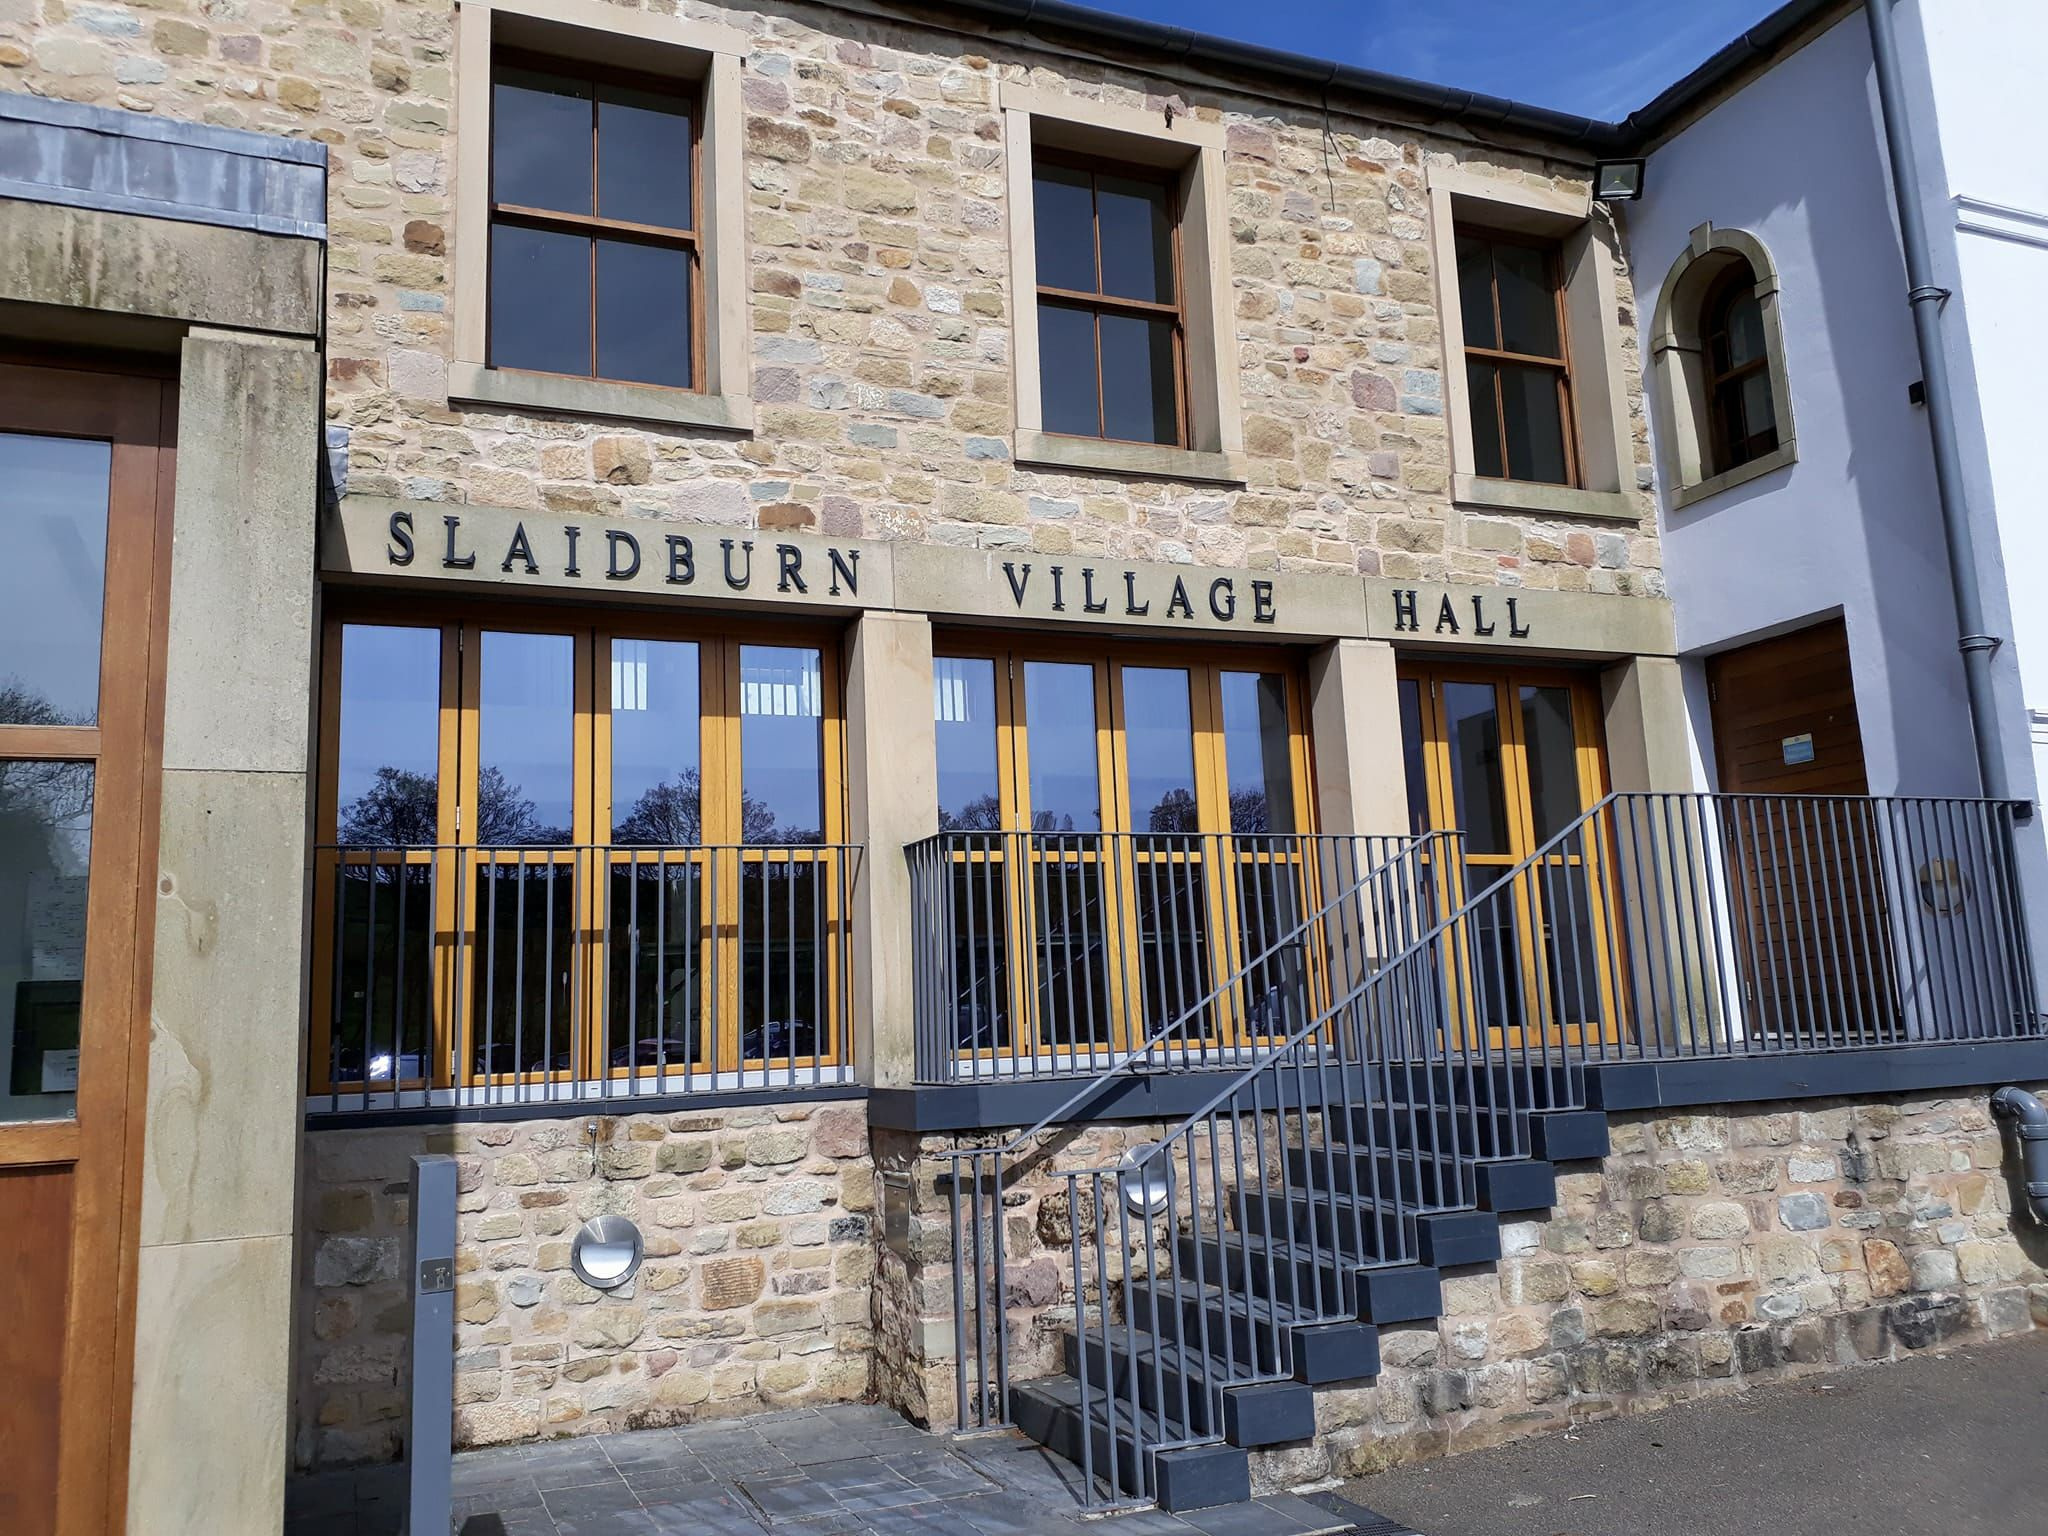 Slaidburn Village Hall for hire